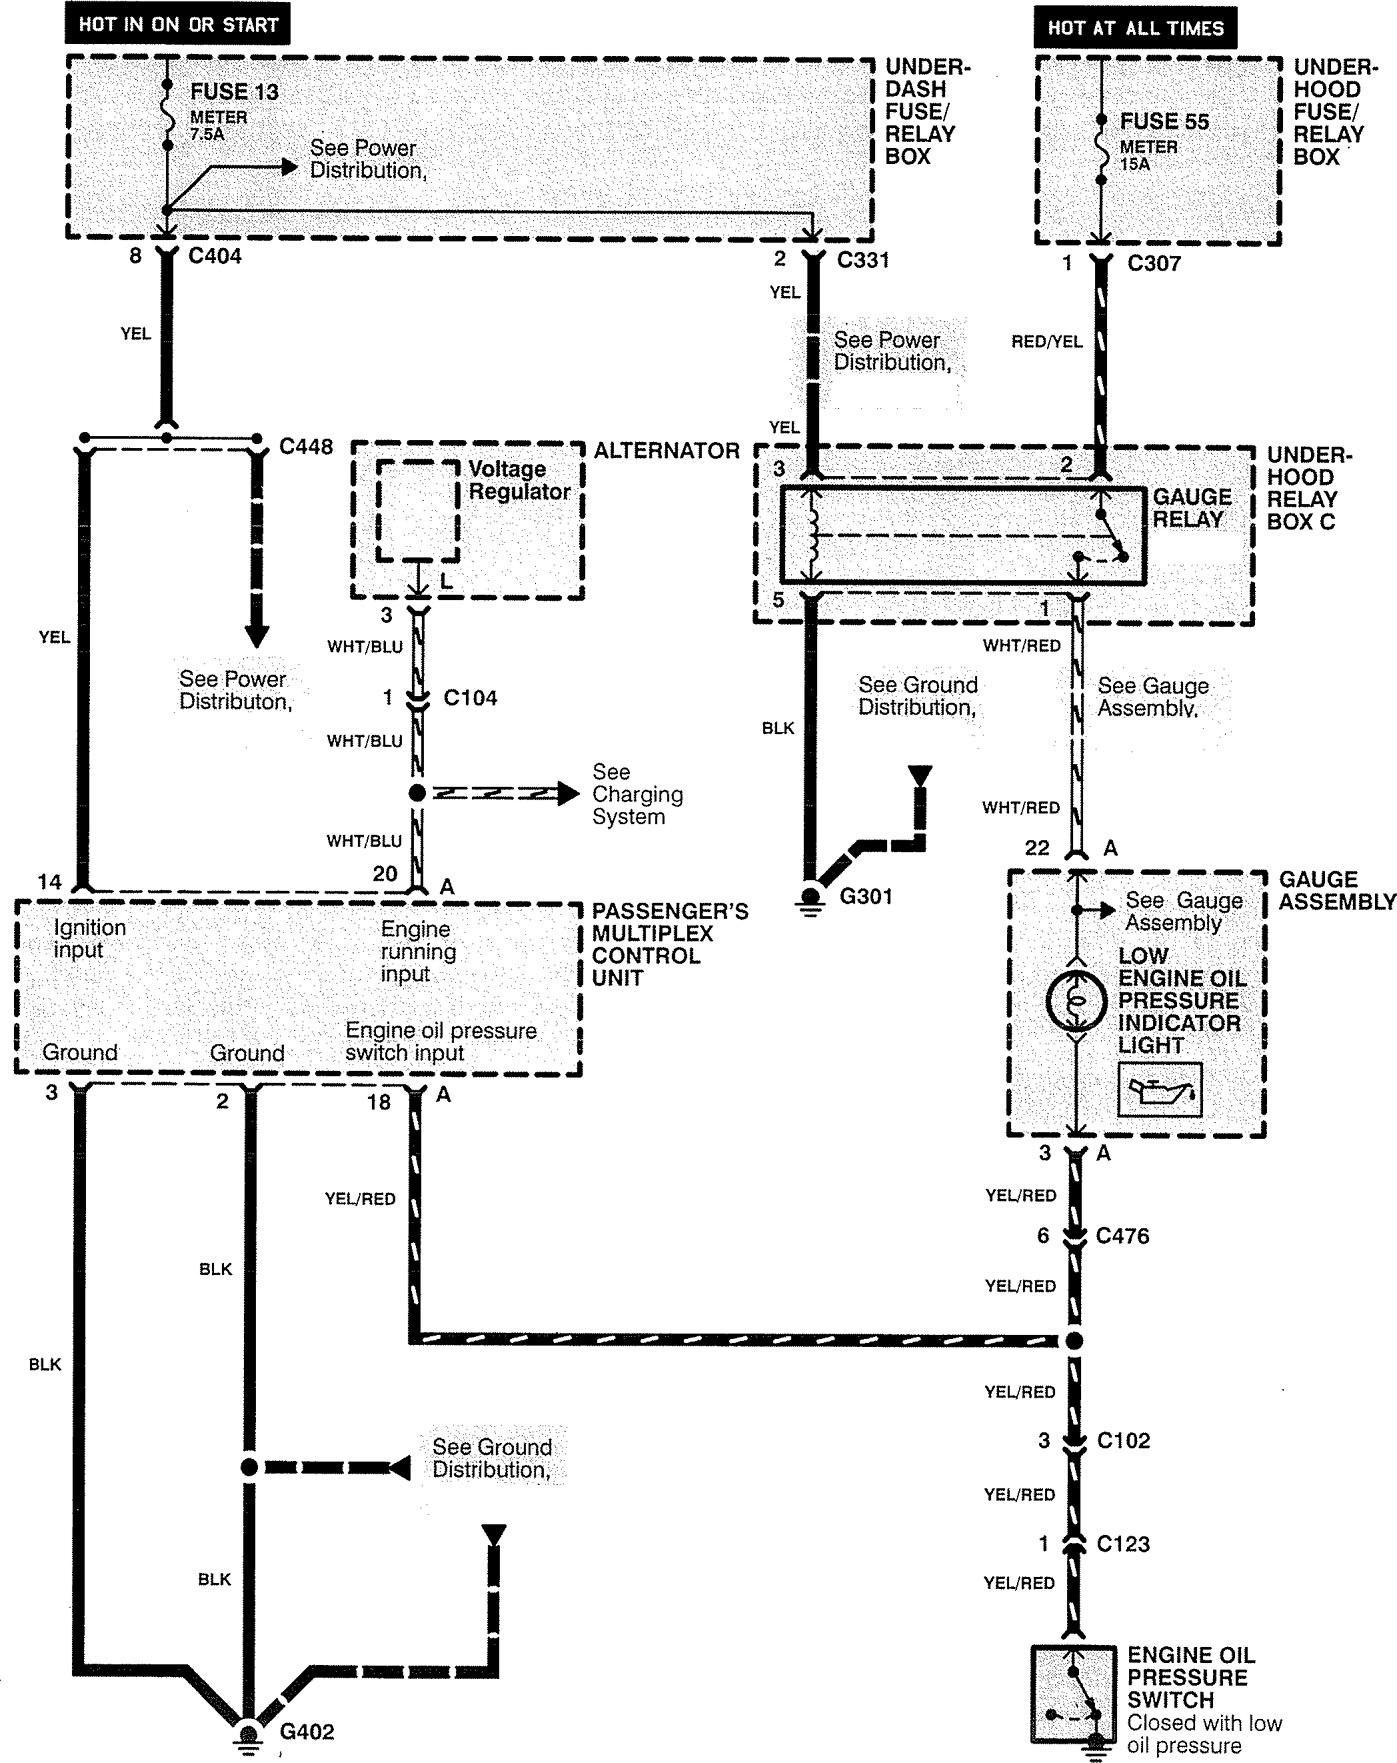 acura rl  1996 - 1997  - wiring diagrams